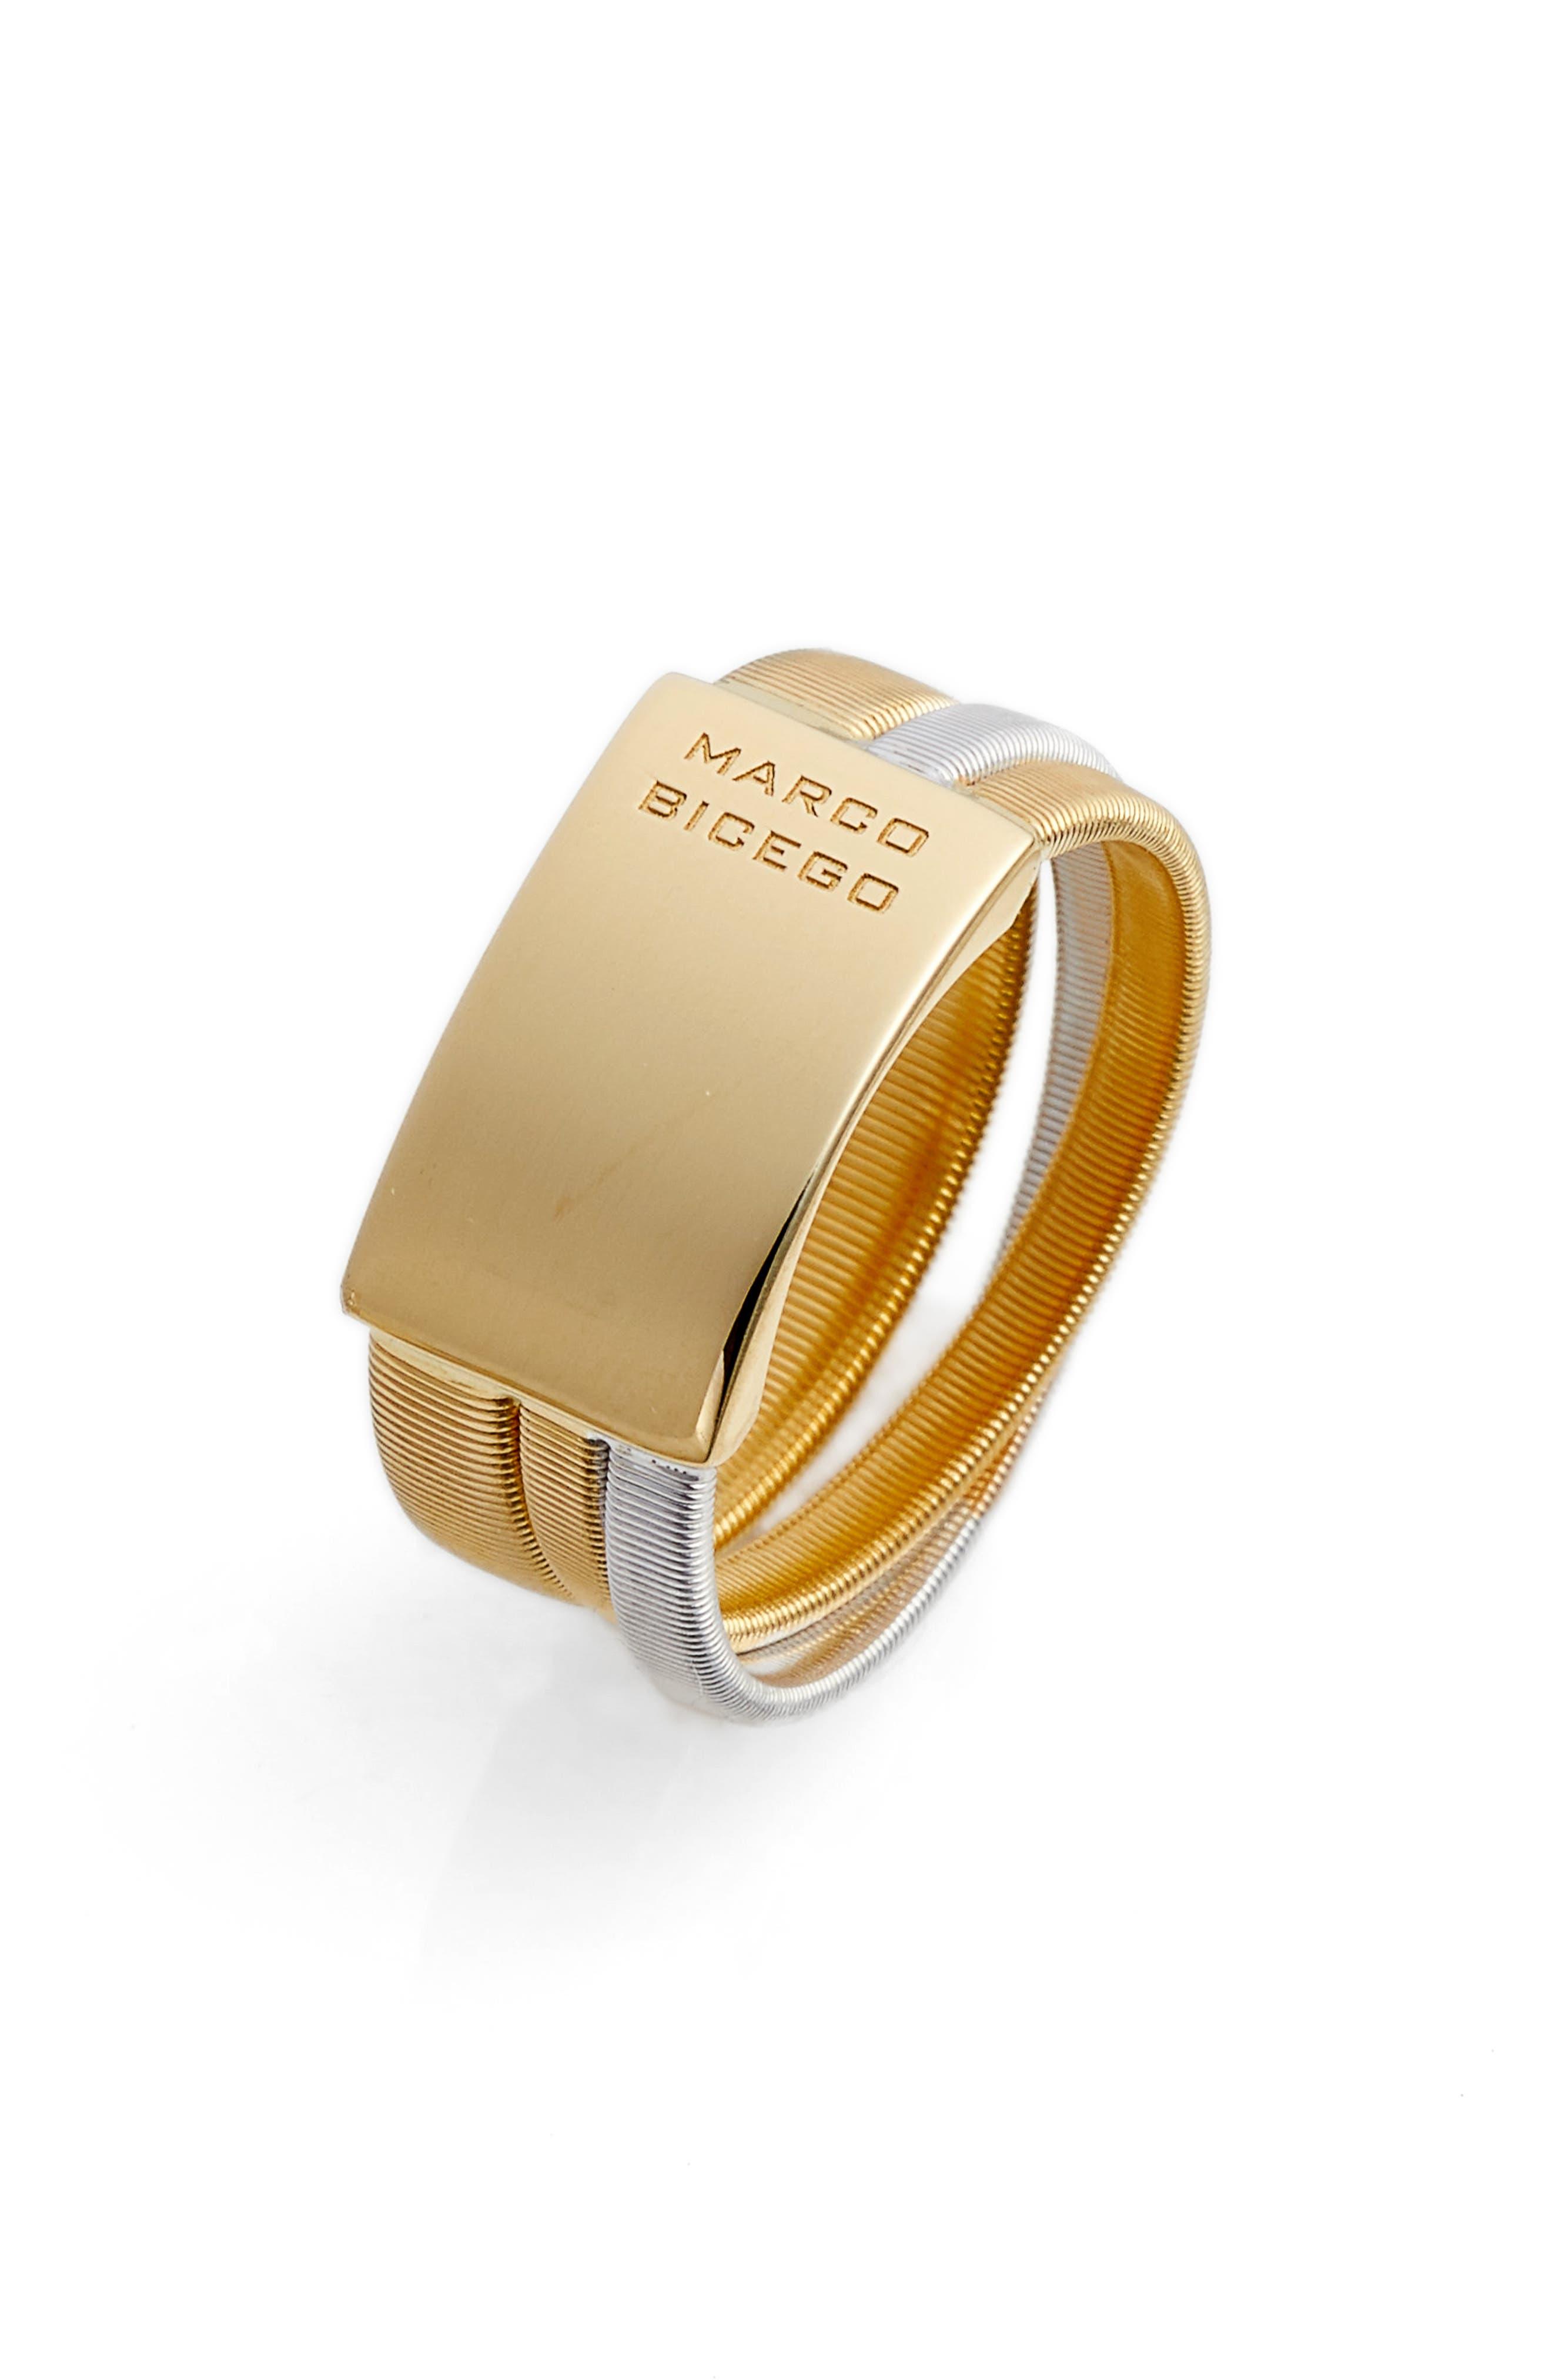 Masai Two-Tone Ring,                             Alternate thumbnail 3, color,                             YELLOW GOLD/ WHITE GOLD